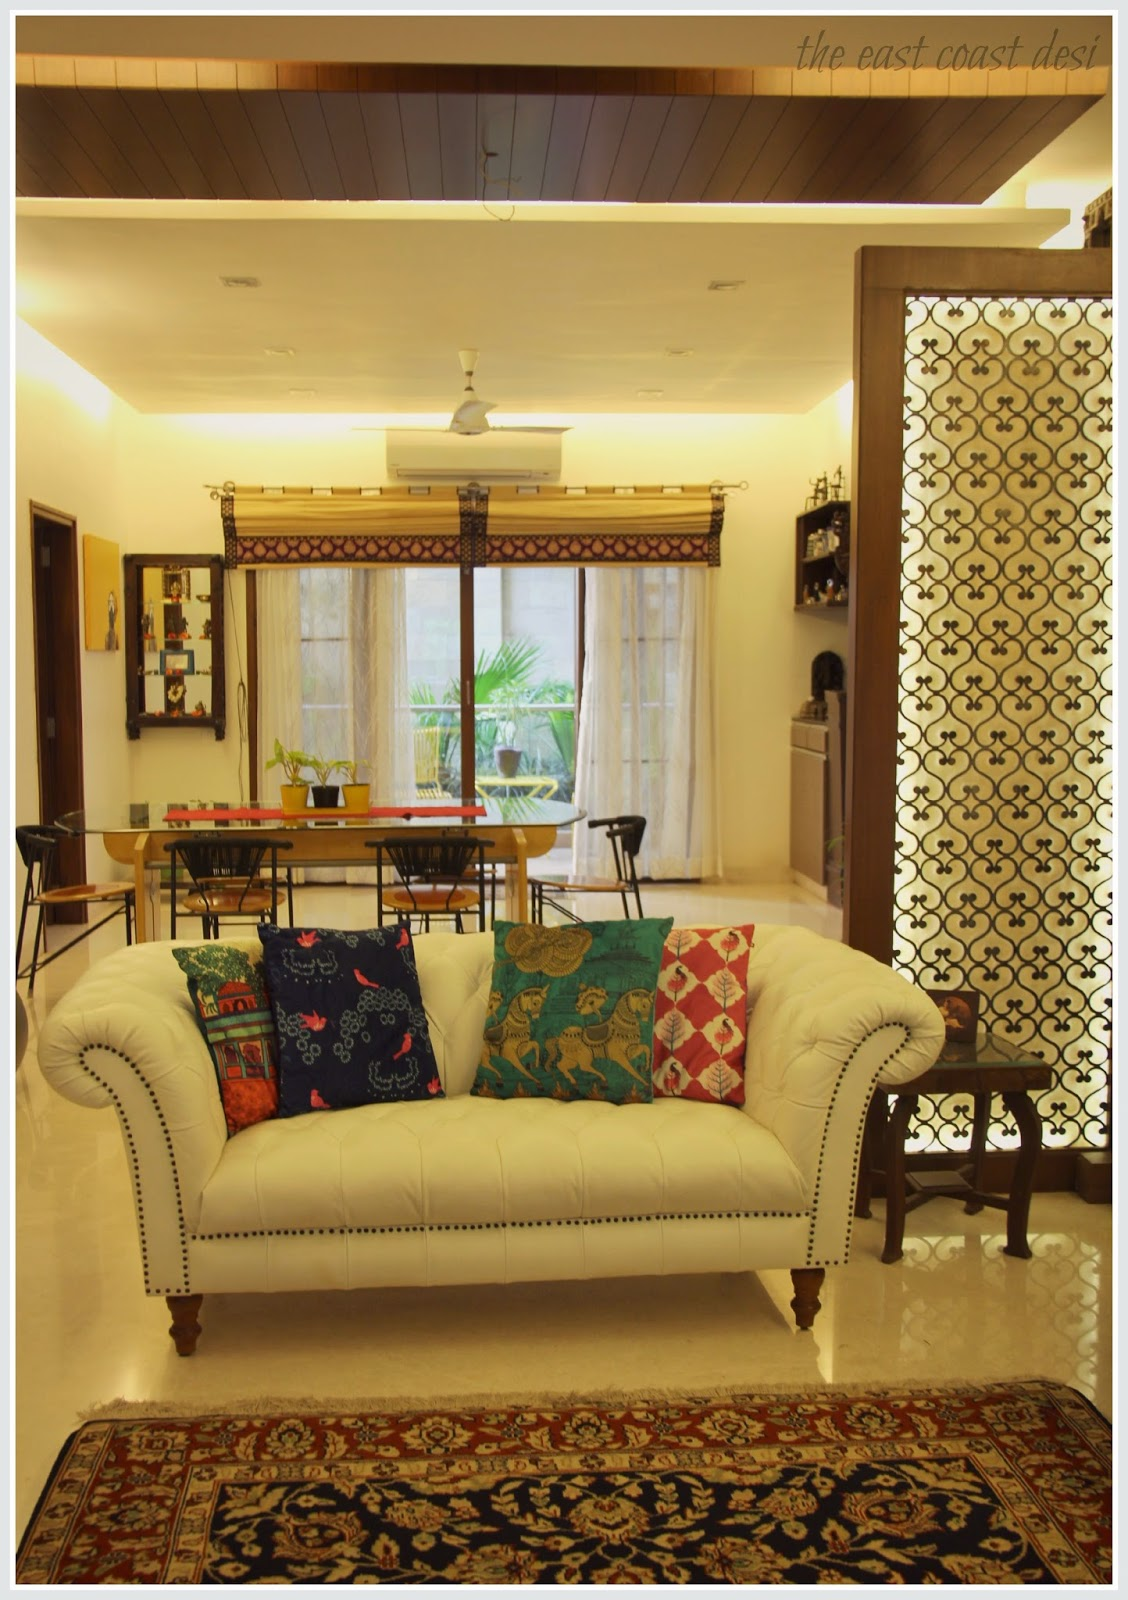 Sofa Cushion Covers Ideas Low Table The East Coast Desi: Masterful Mixing (home Tour)